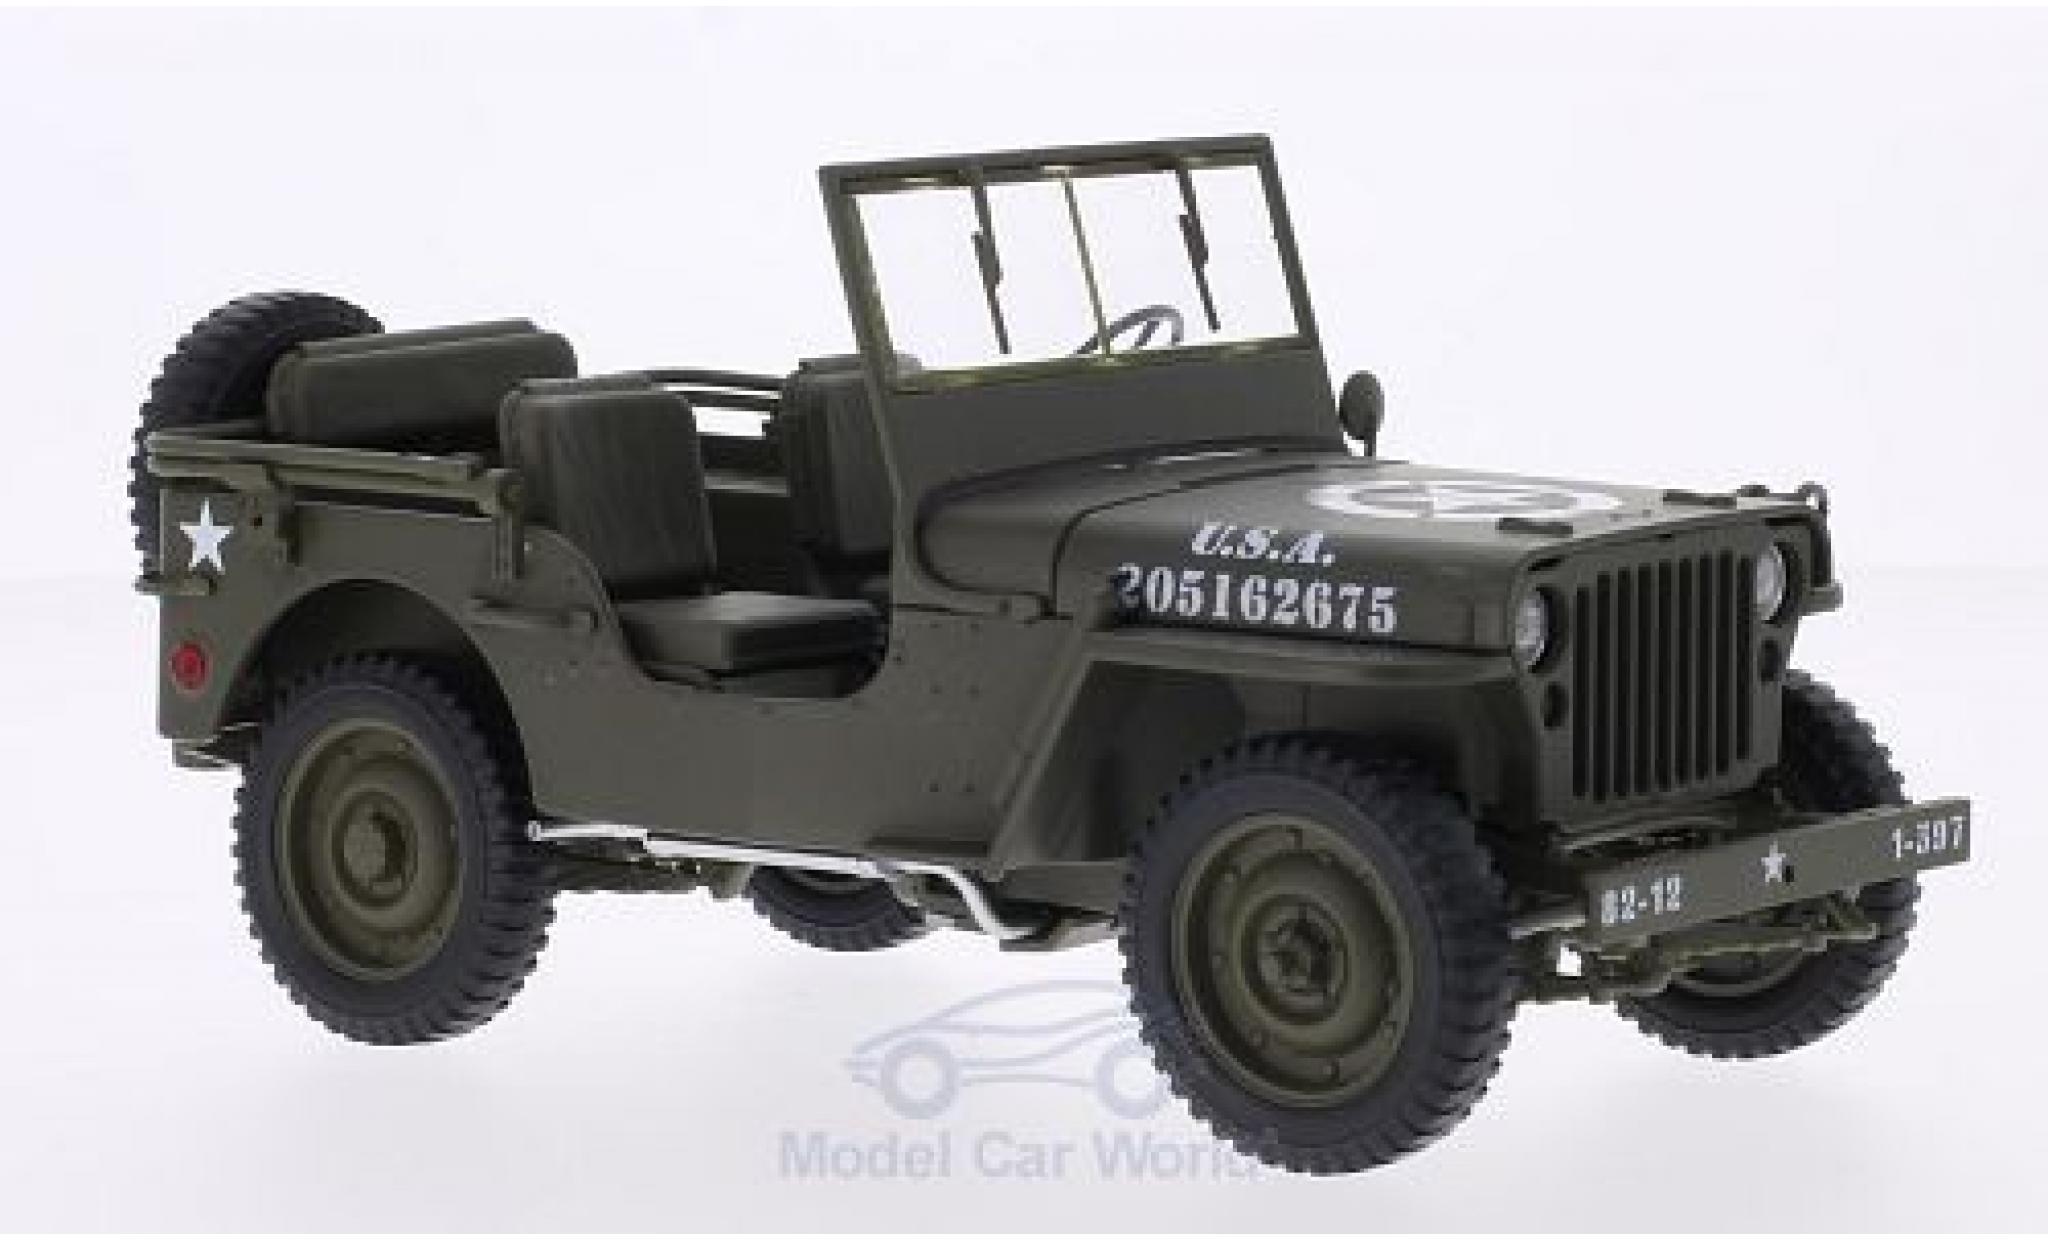 Jeep Willys 1/18 Welly matt-oliv U.S. Army offen